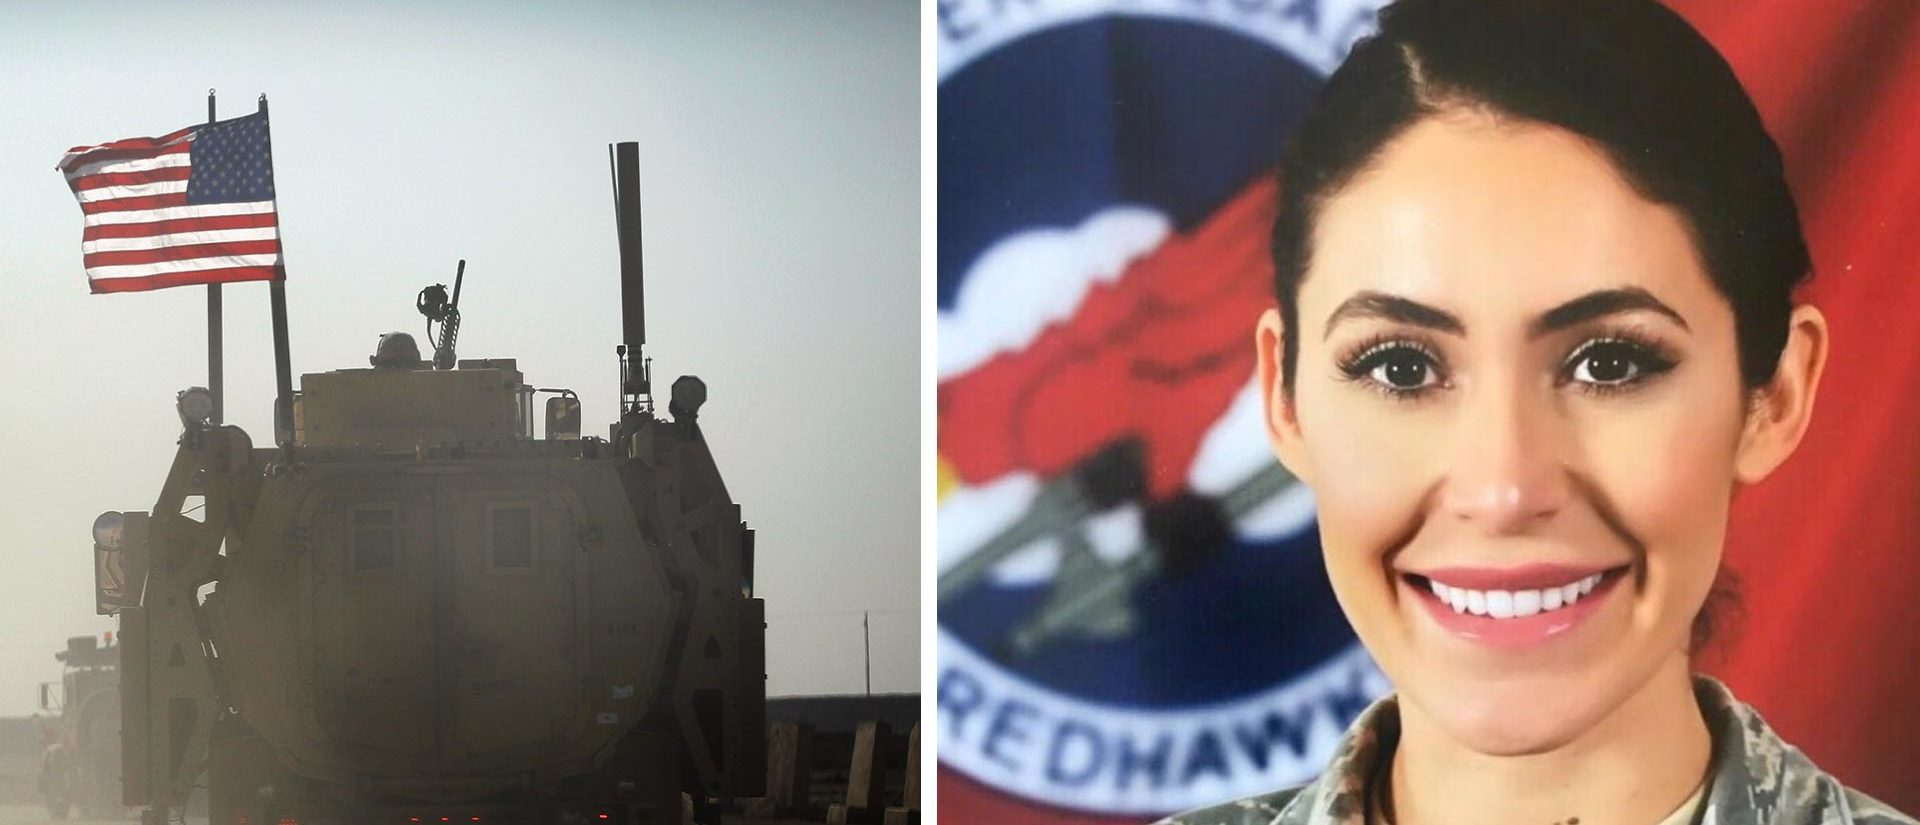 Honoring The Sacrifices Of American Heroes: Anna Paulina Luna